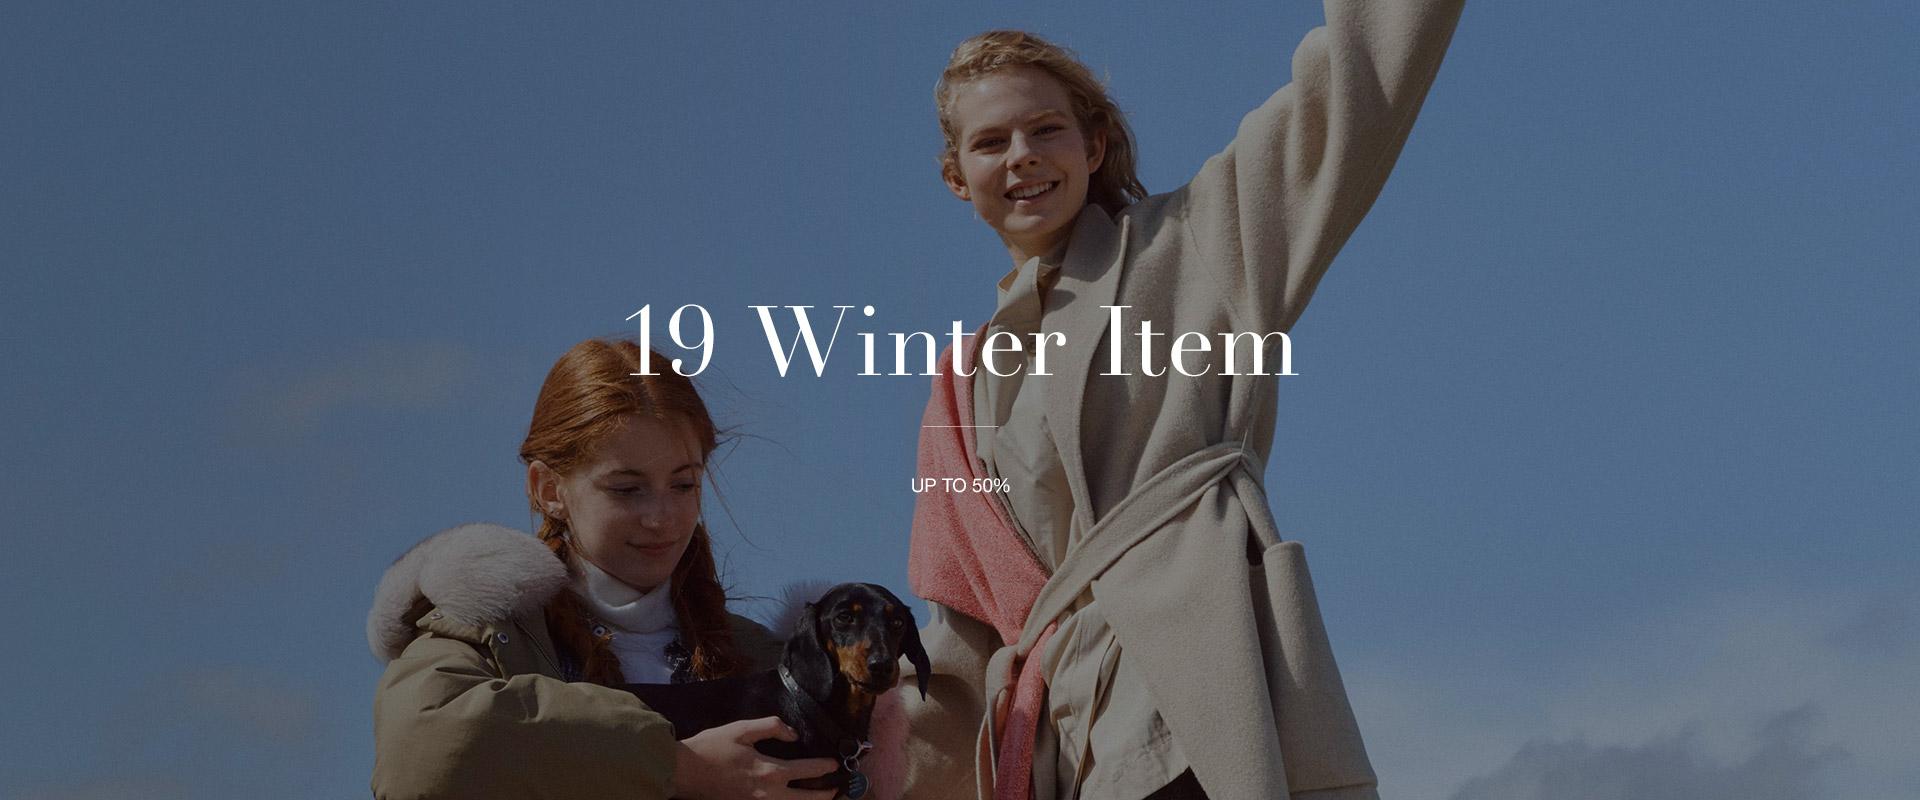 19 Winter Item